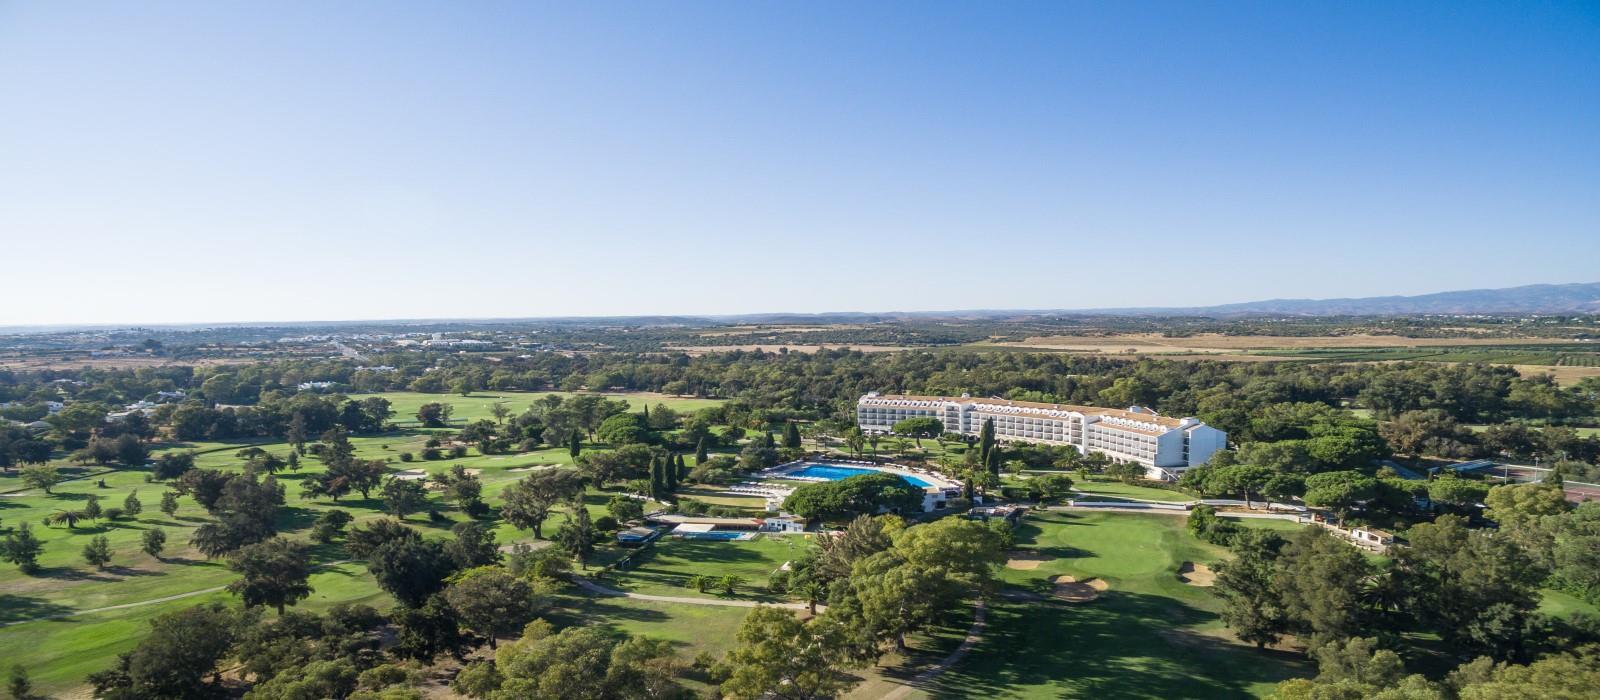 Penina Hotel & Golf Resort 5* - 7 Nights Bed & Breakfast, 7 Rounds